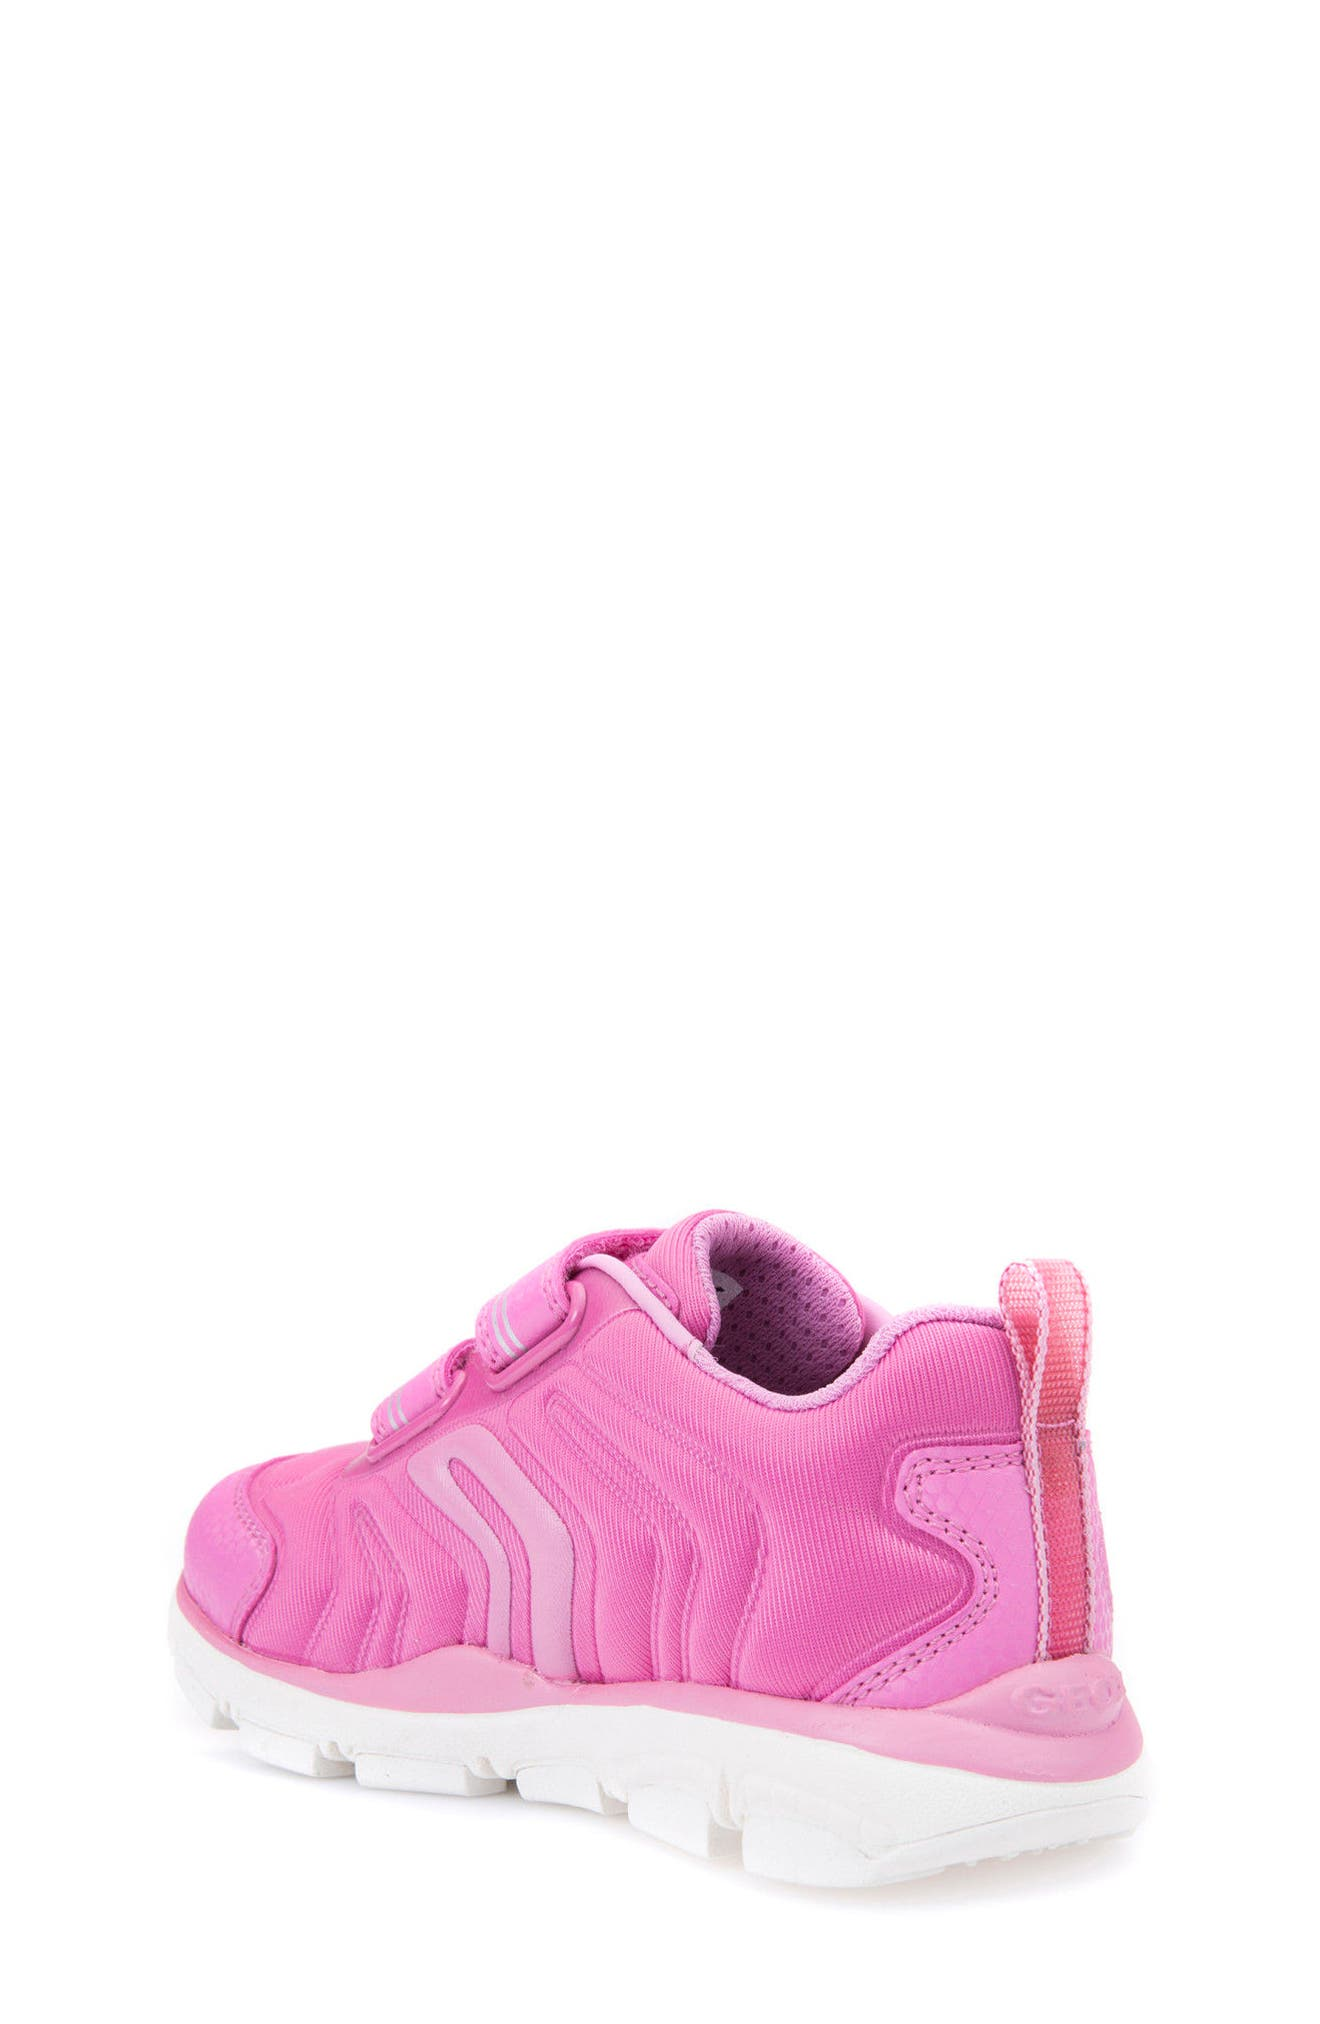 Torque Sneaker,                             Alternate thumbnail 2, color,                             Fuchsia/ Dark Pink